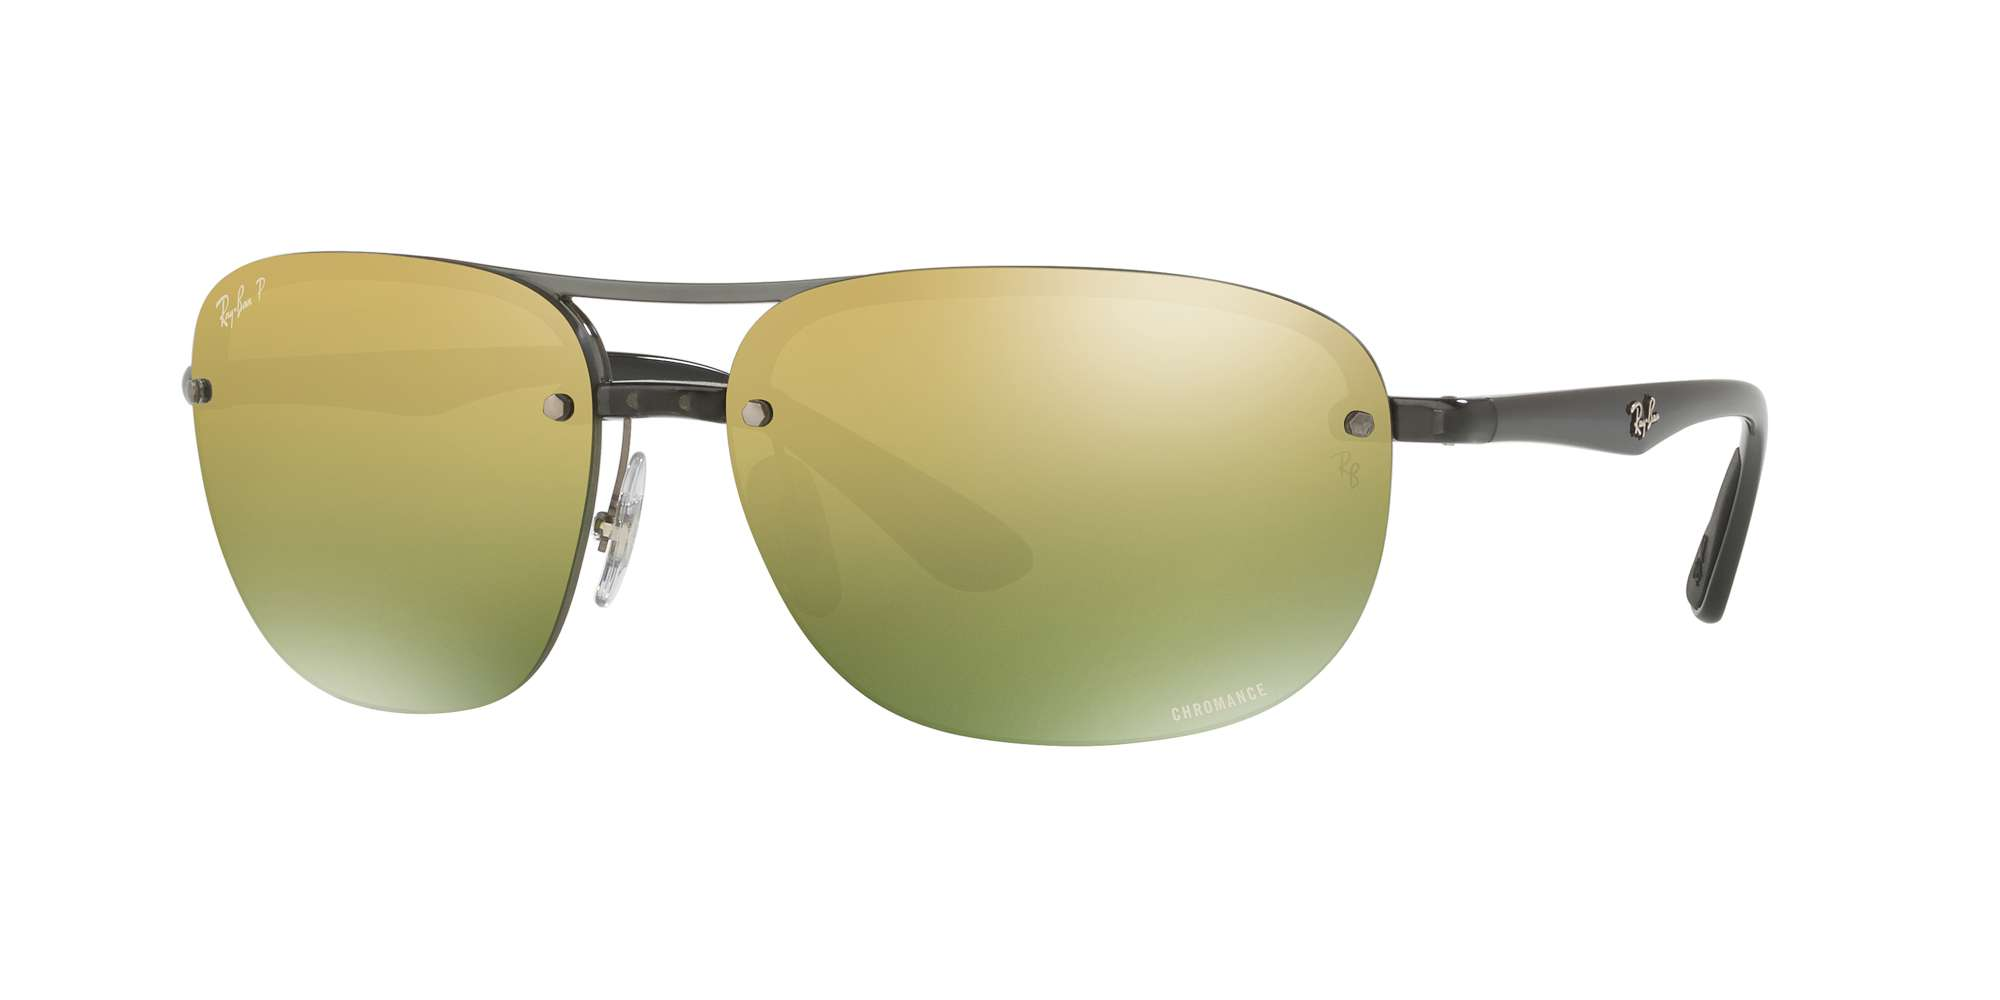 SHINY GREY / GREEN MIR GOLD GRADIENT POLAR lenses